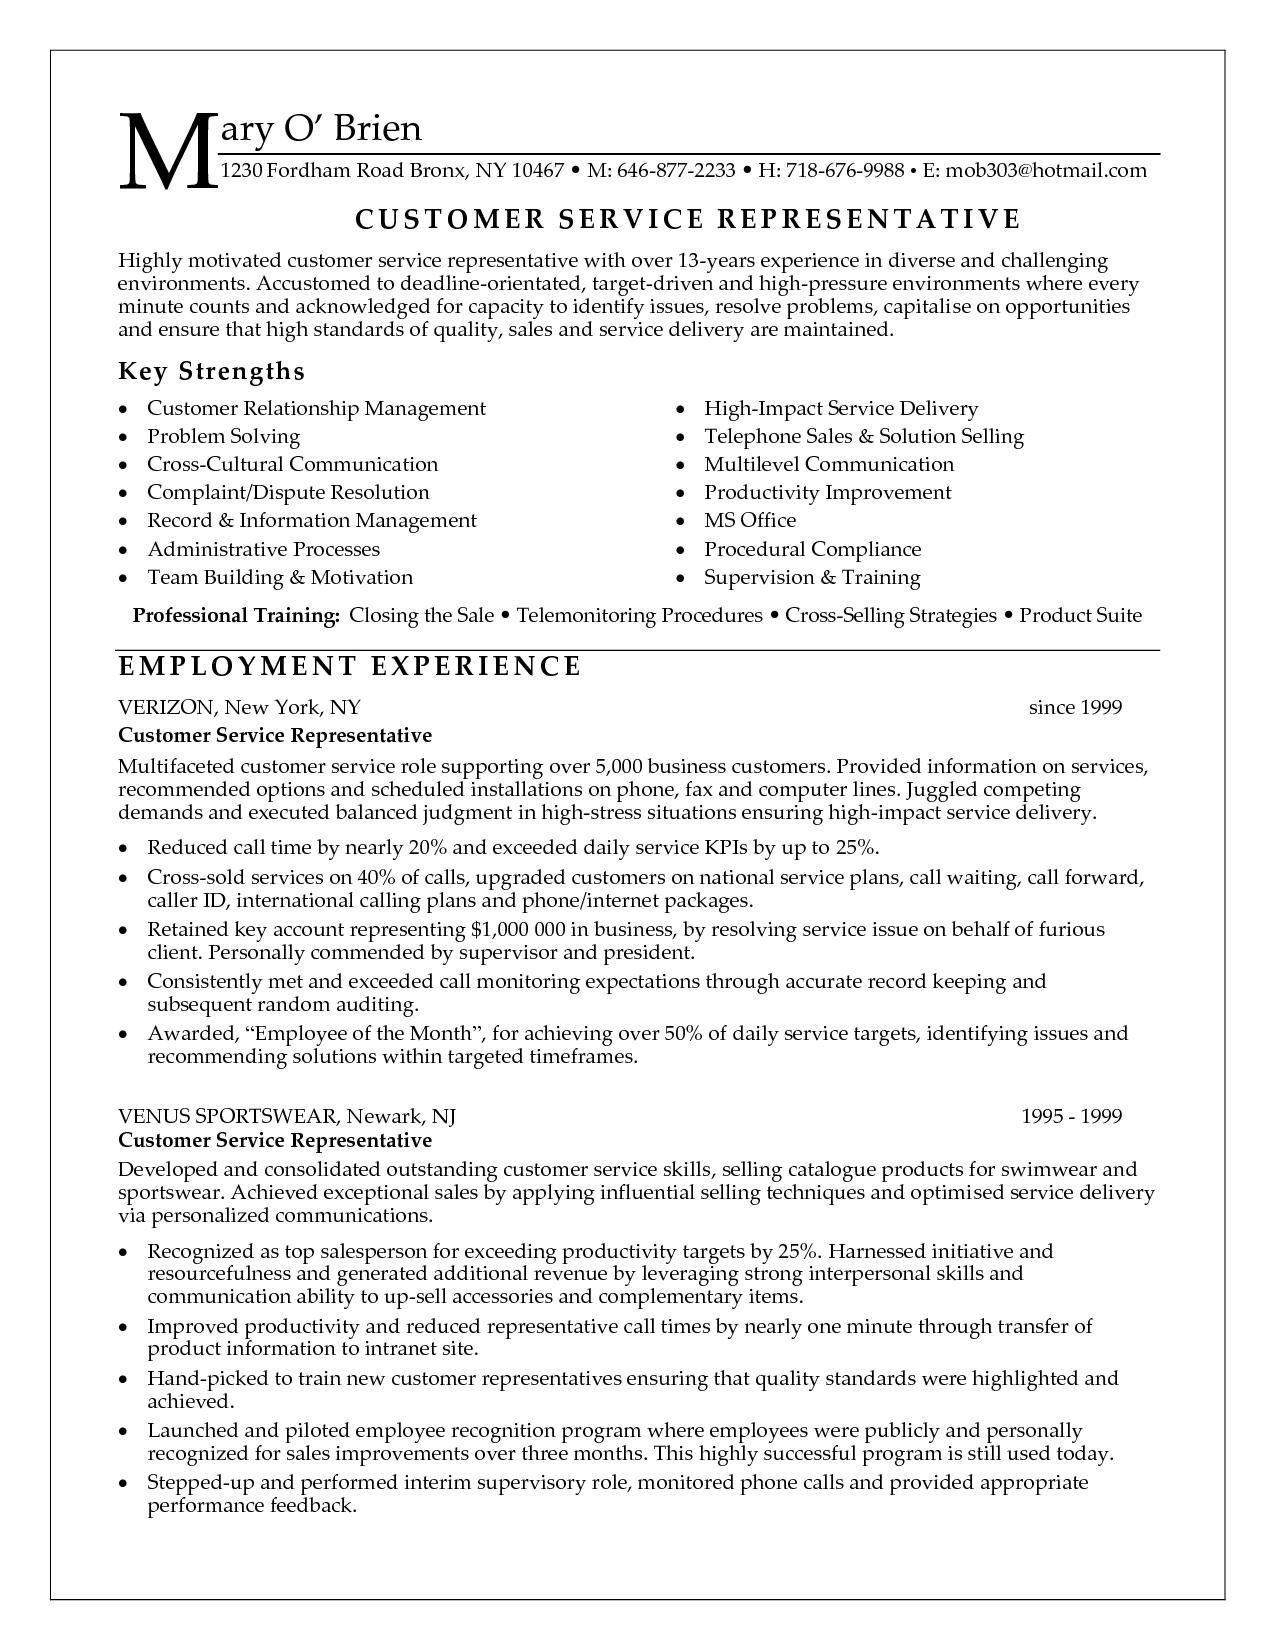 resume for customer service representative httpwwwresumecareerinfo